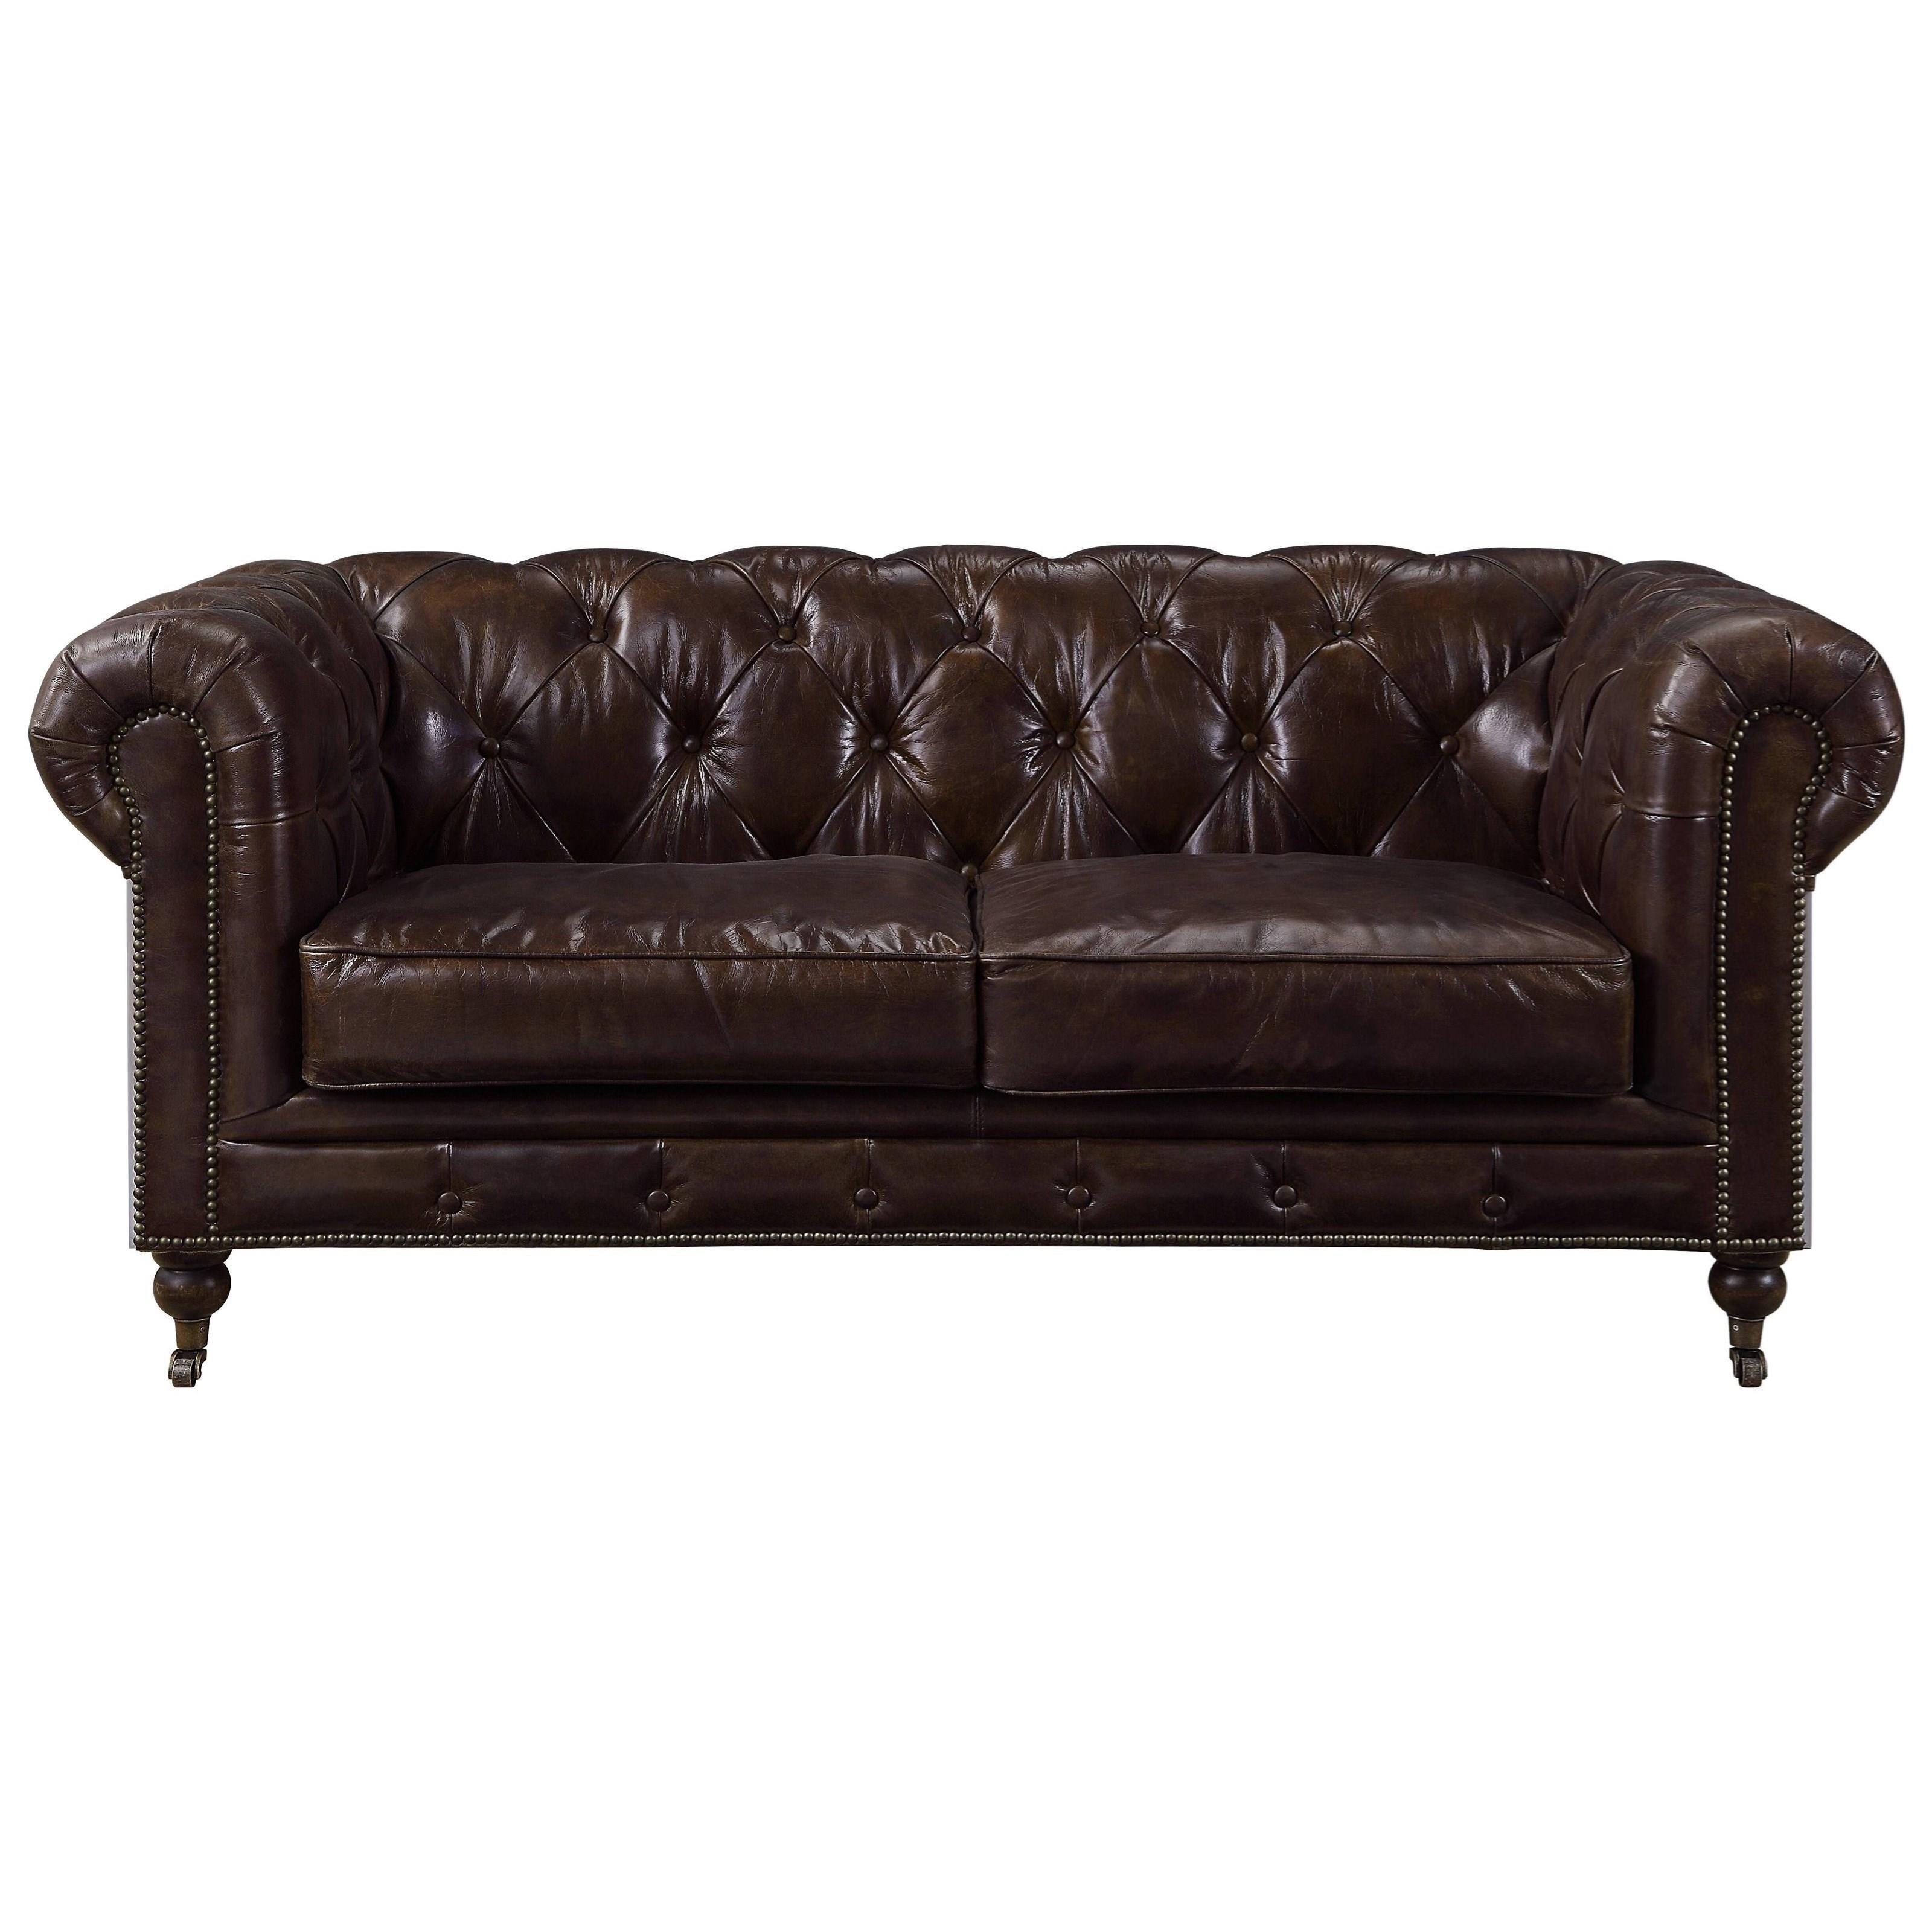 Aberdeen Loveseat by Acme Furniture at Nassau Furniture and Mattress